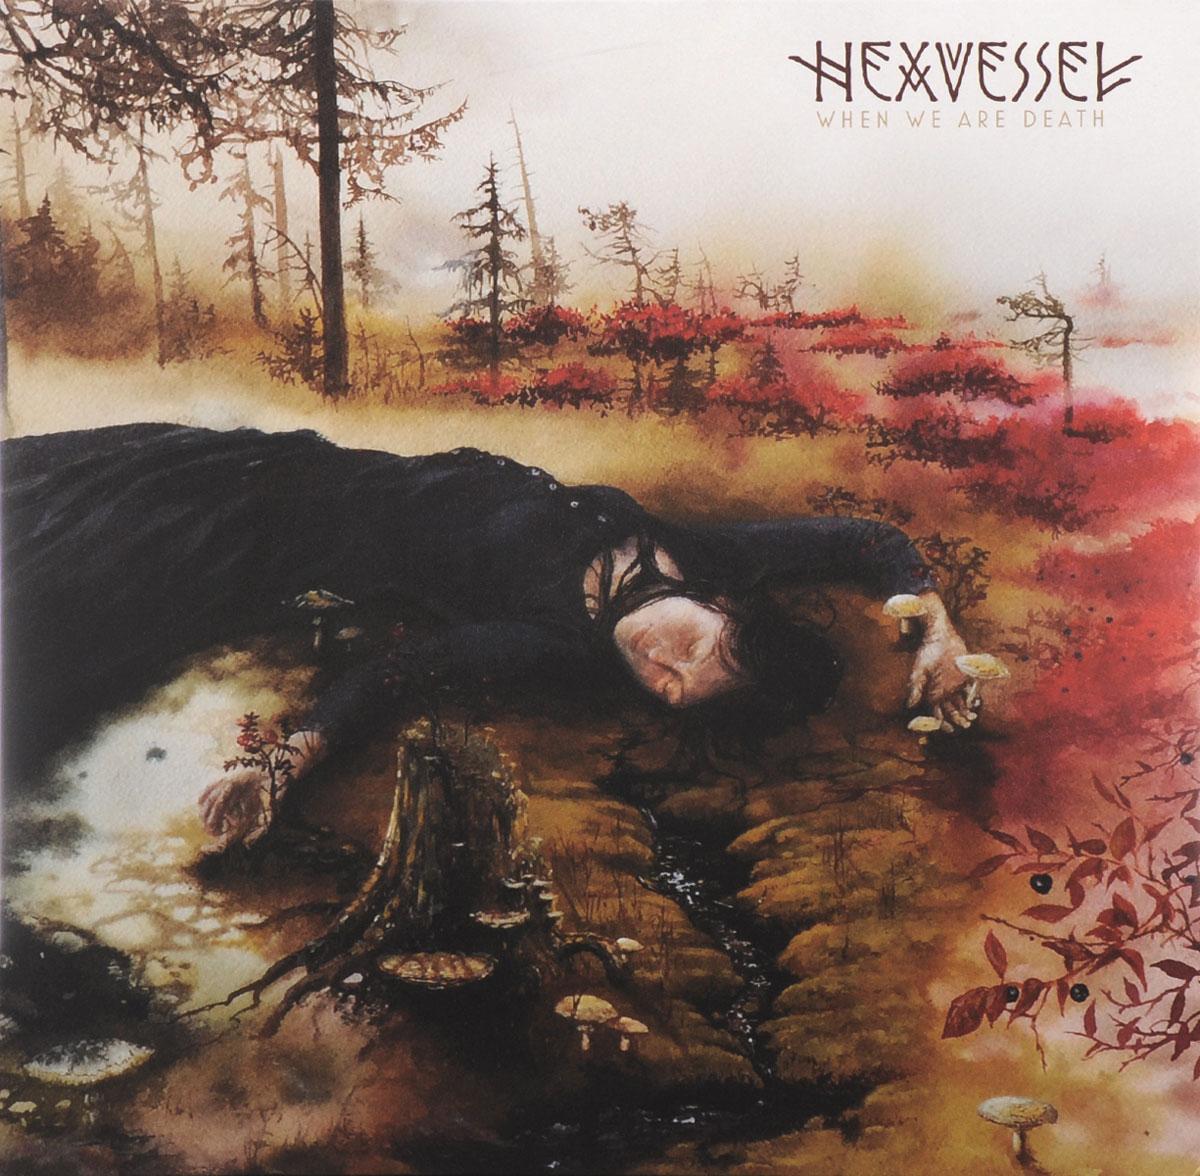 Hexvessel Hexvessel. When We Are Death (LP) when death speaks